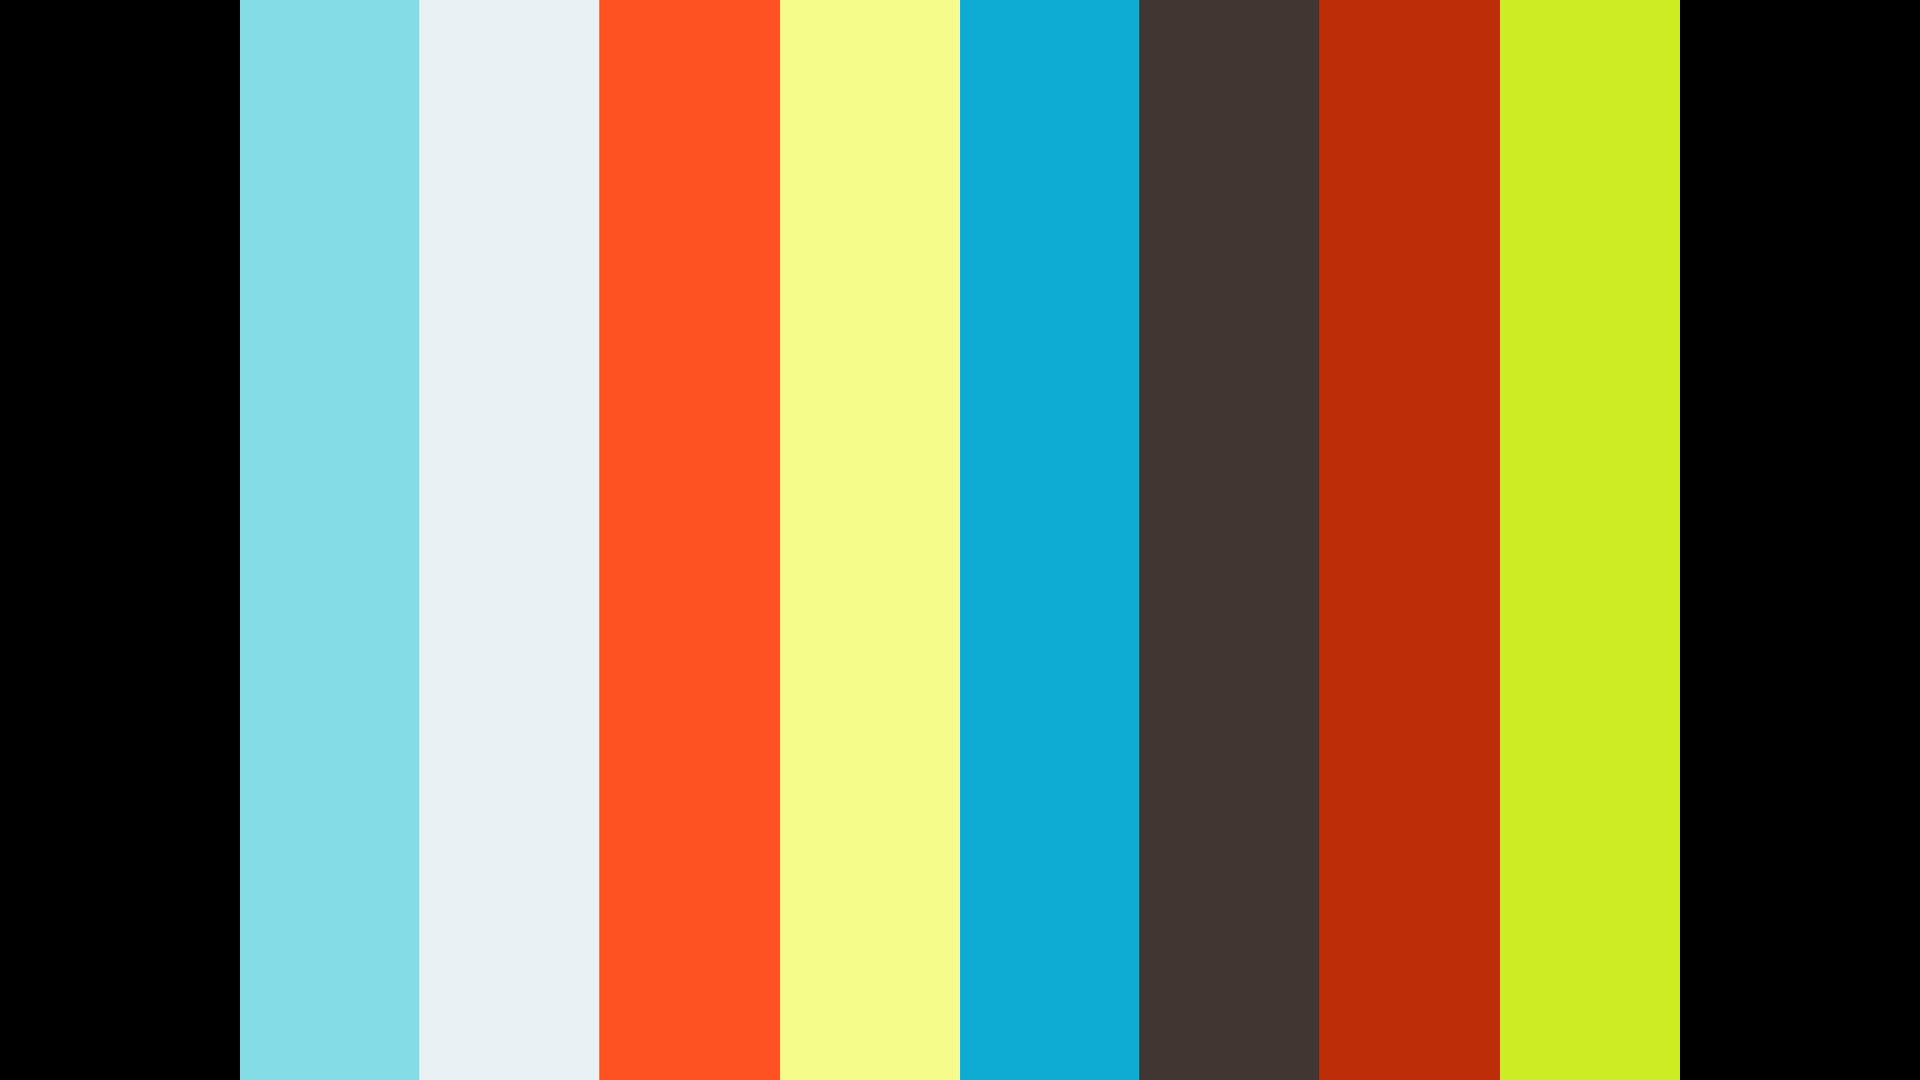 ANIMAL4_TOILEWEB01_VIMEO